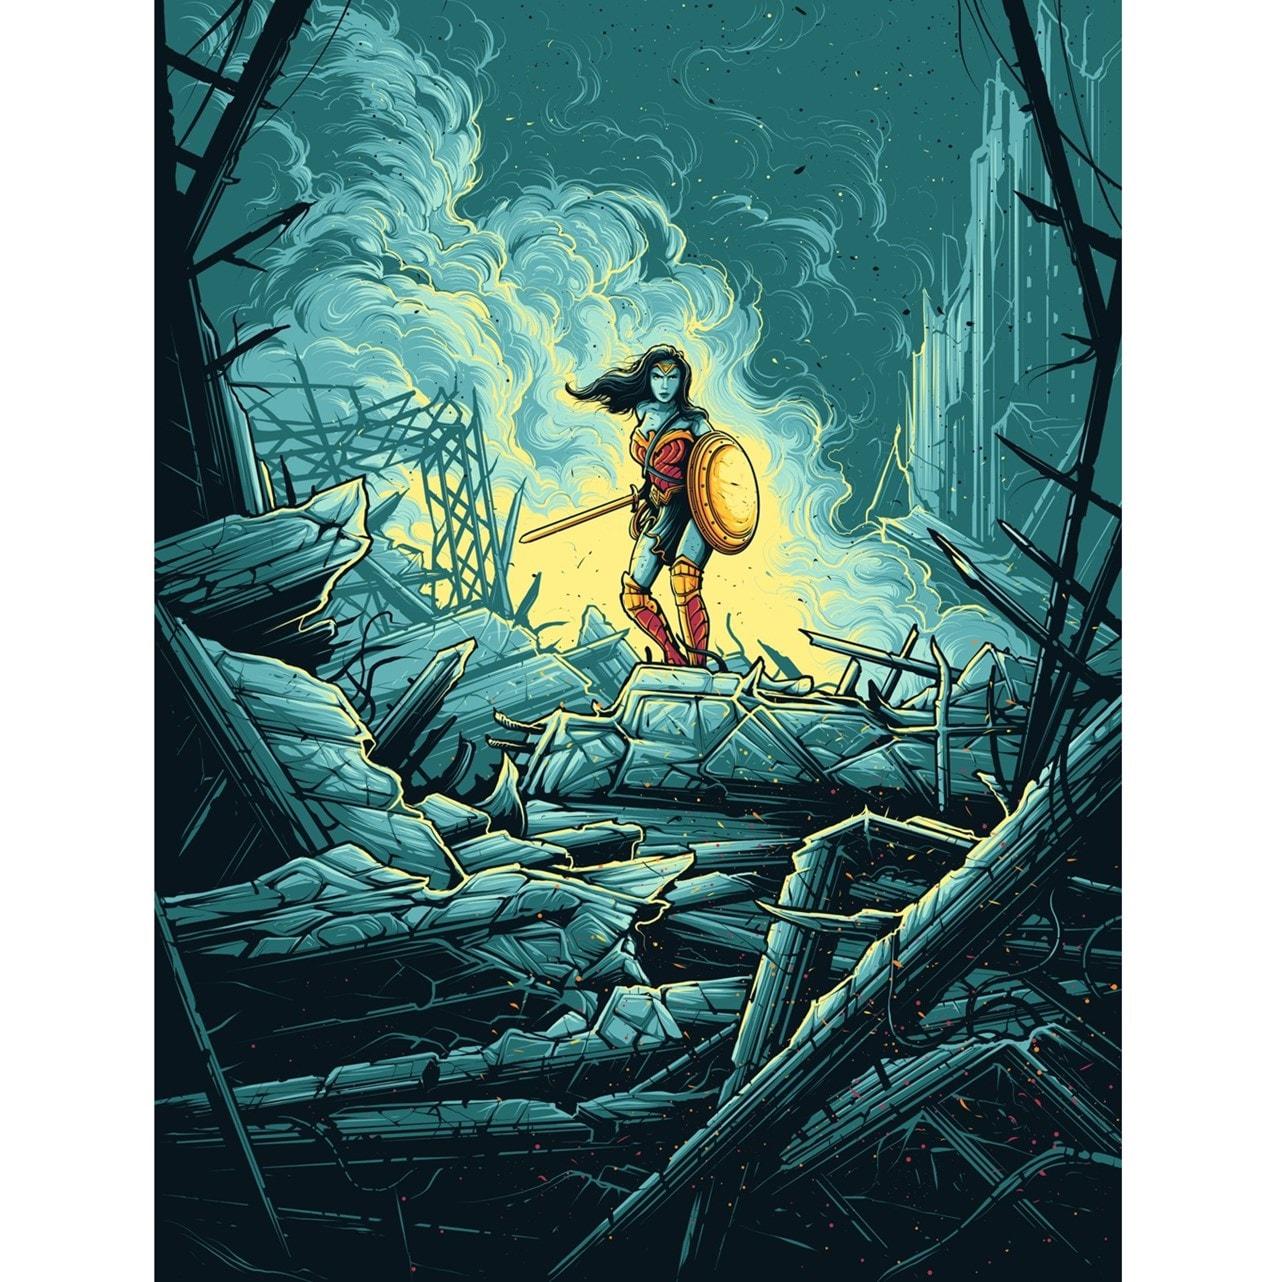 Wonder Woman Warrior Limited Edition Art Print - 1